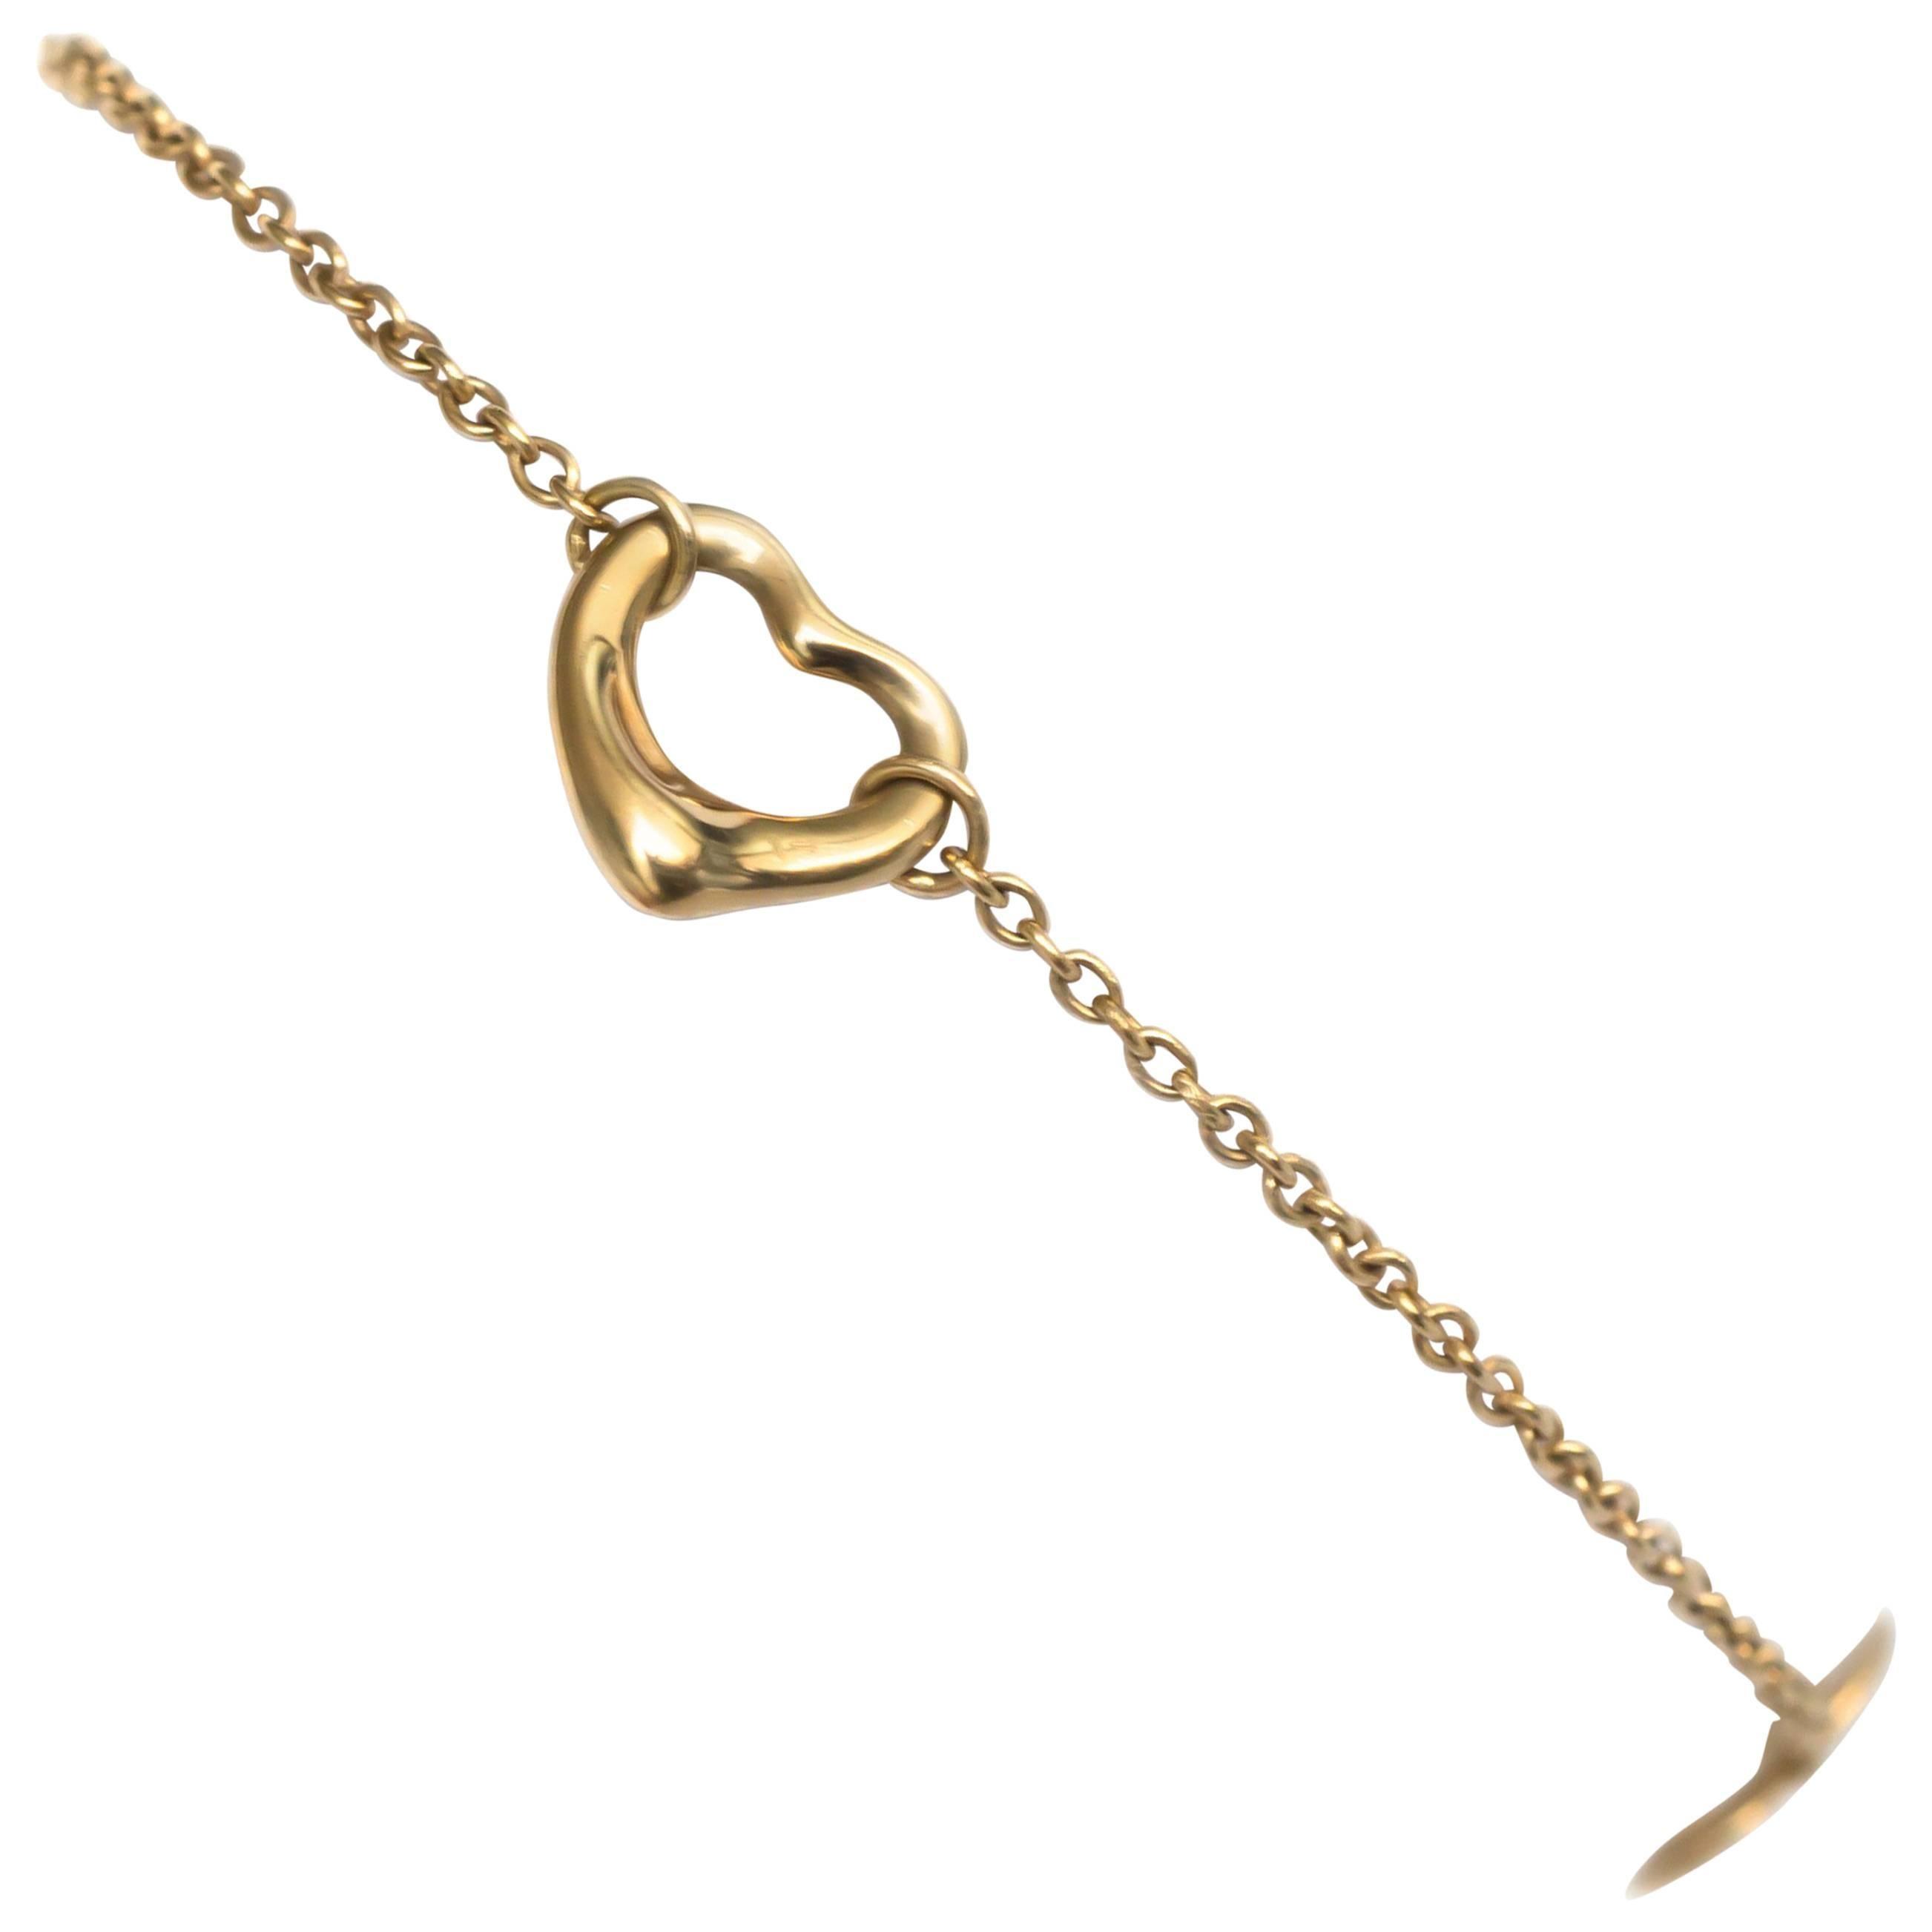 Elsa Peretti by Tiffany & Co Yellow Gold Bracelet